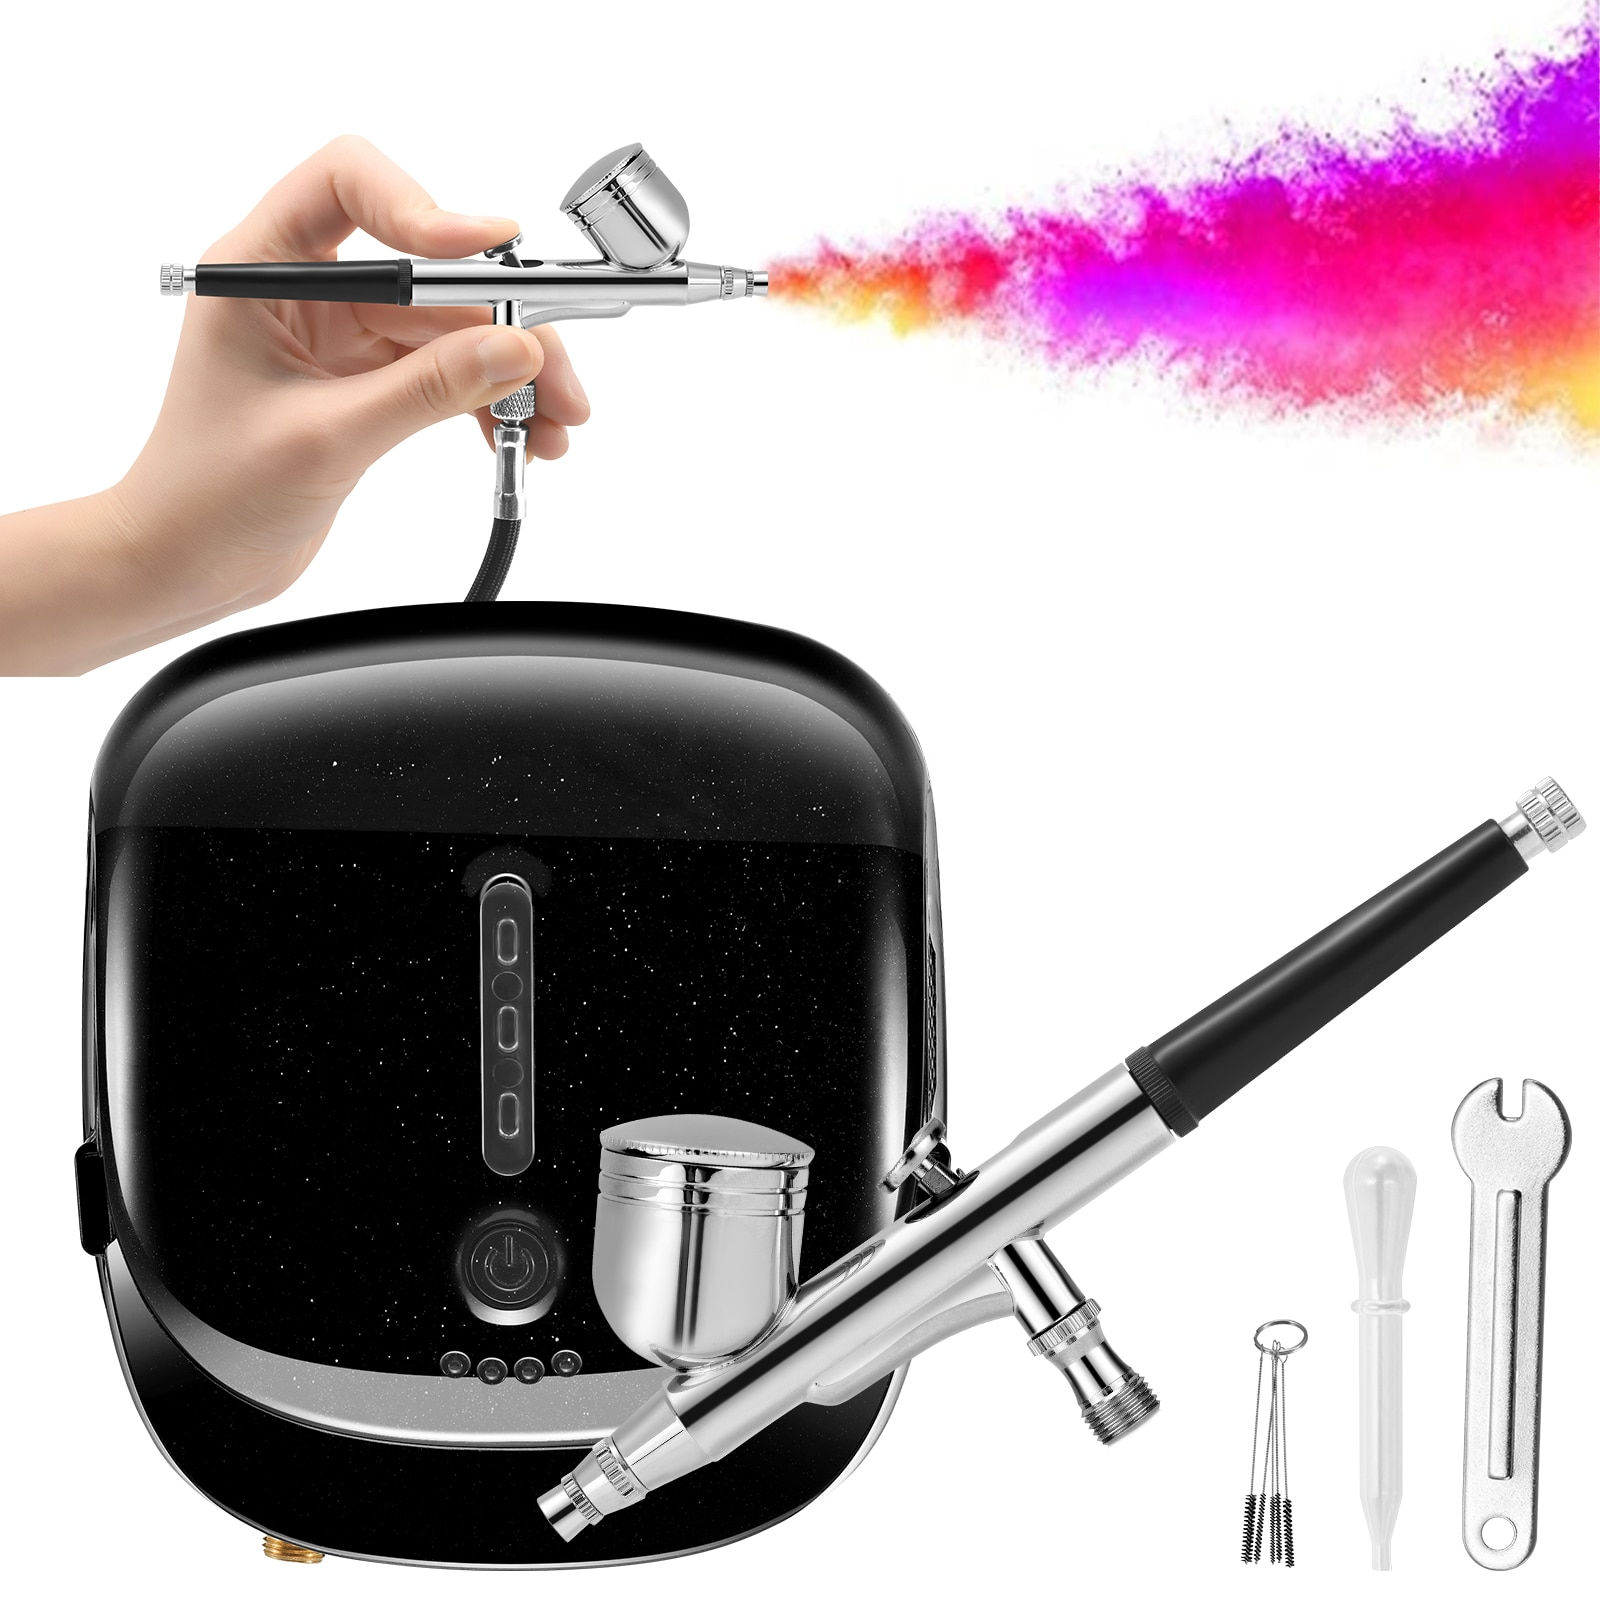 Airbrush Kit Single Power Compressor Portable Touch Machine Air Brush Use For Tattoo Body Paint Tool Acrylic Nail Art EU US Plug